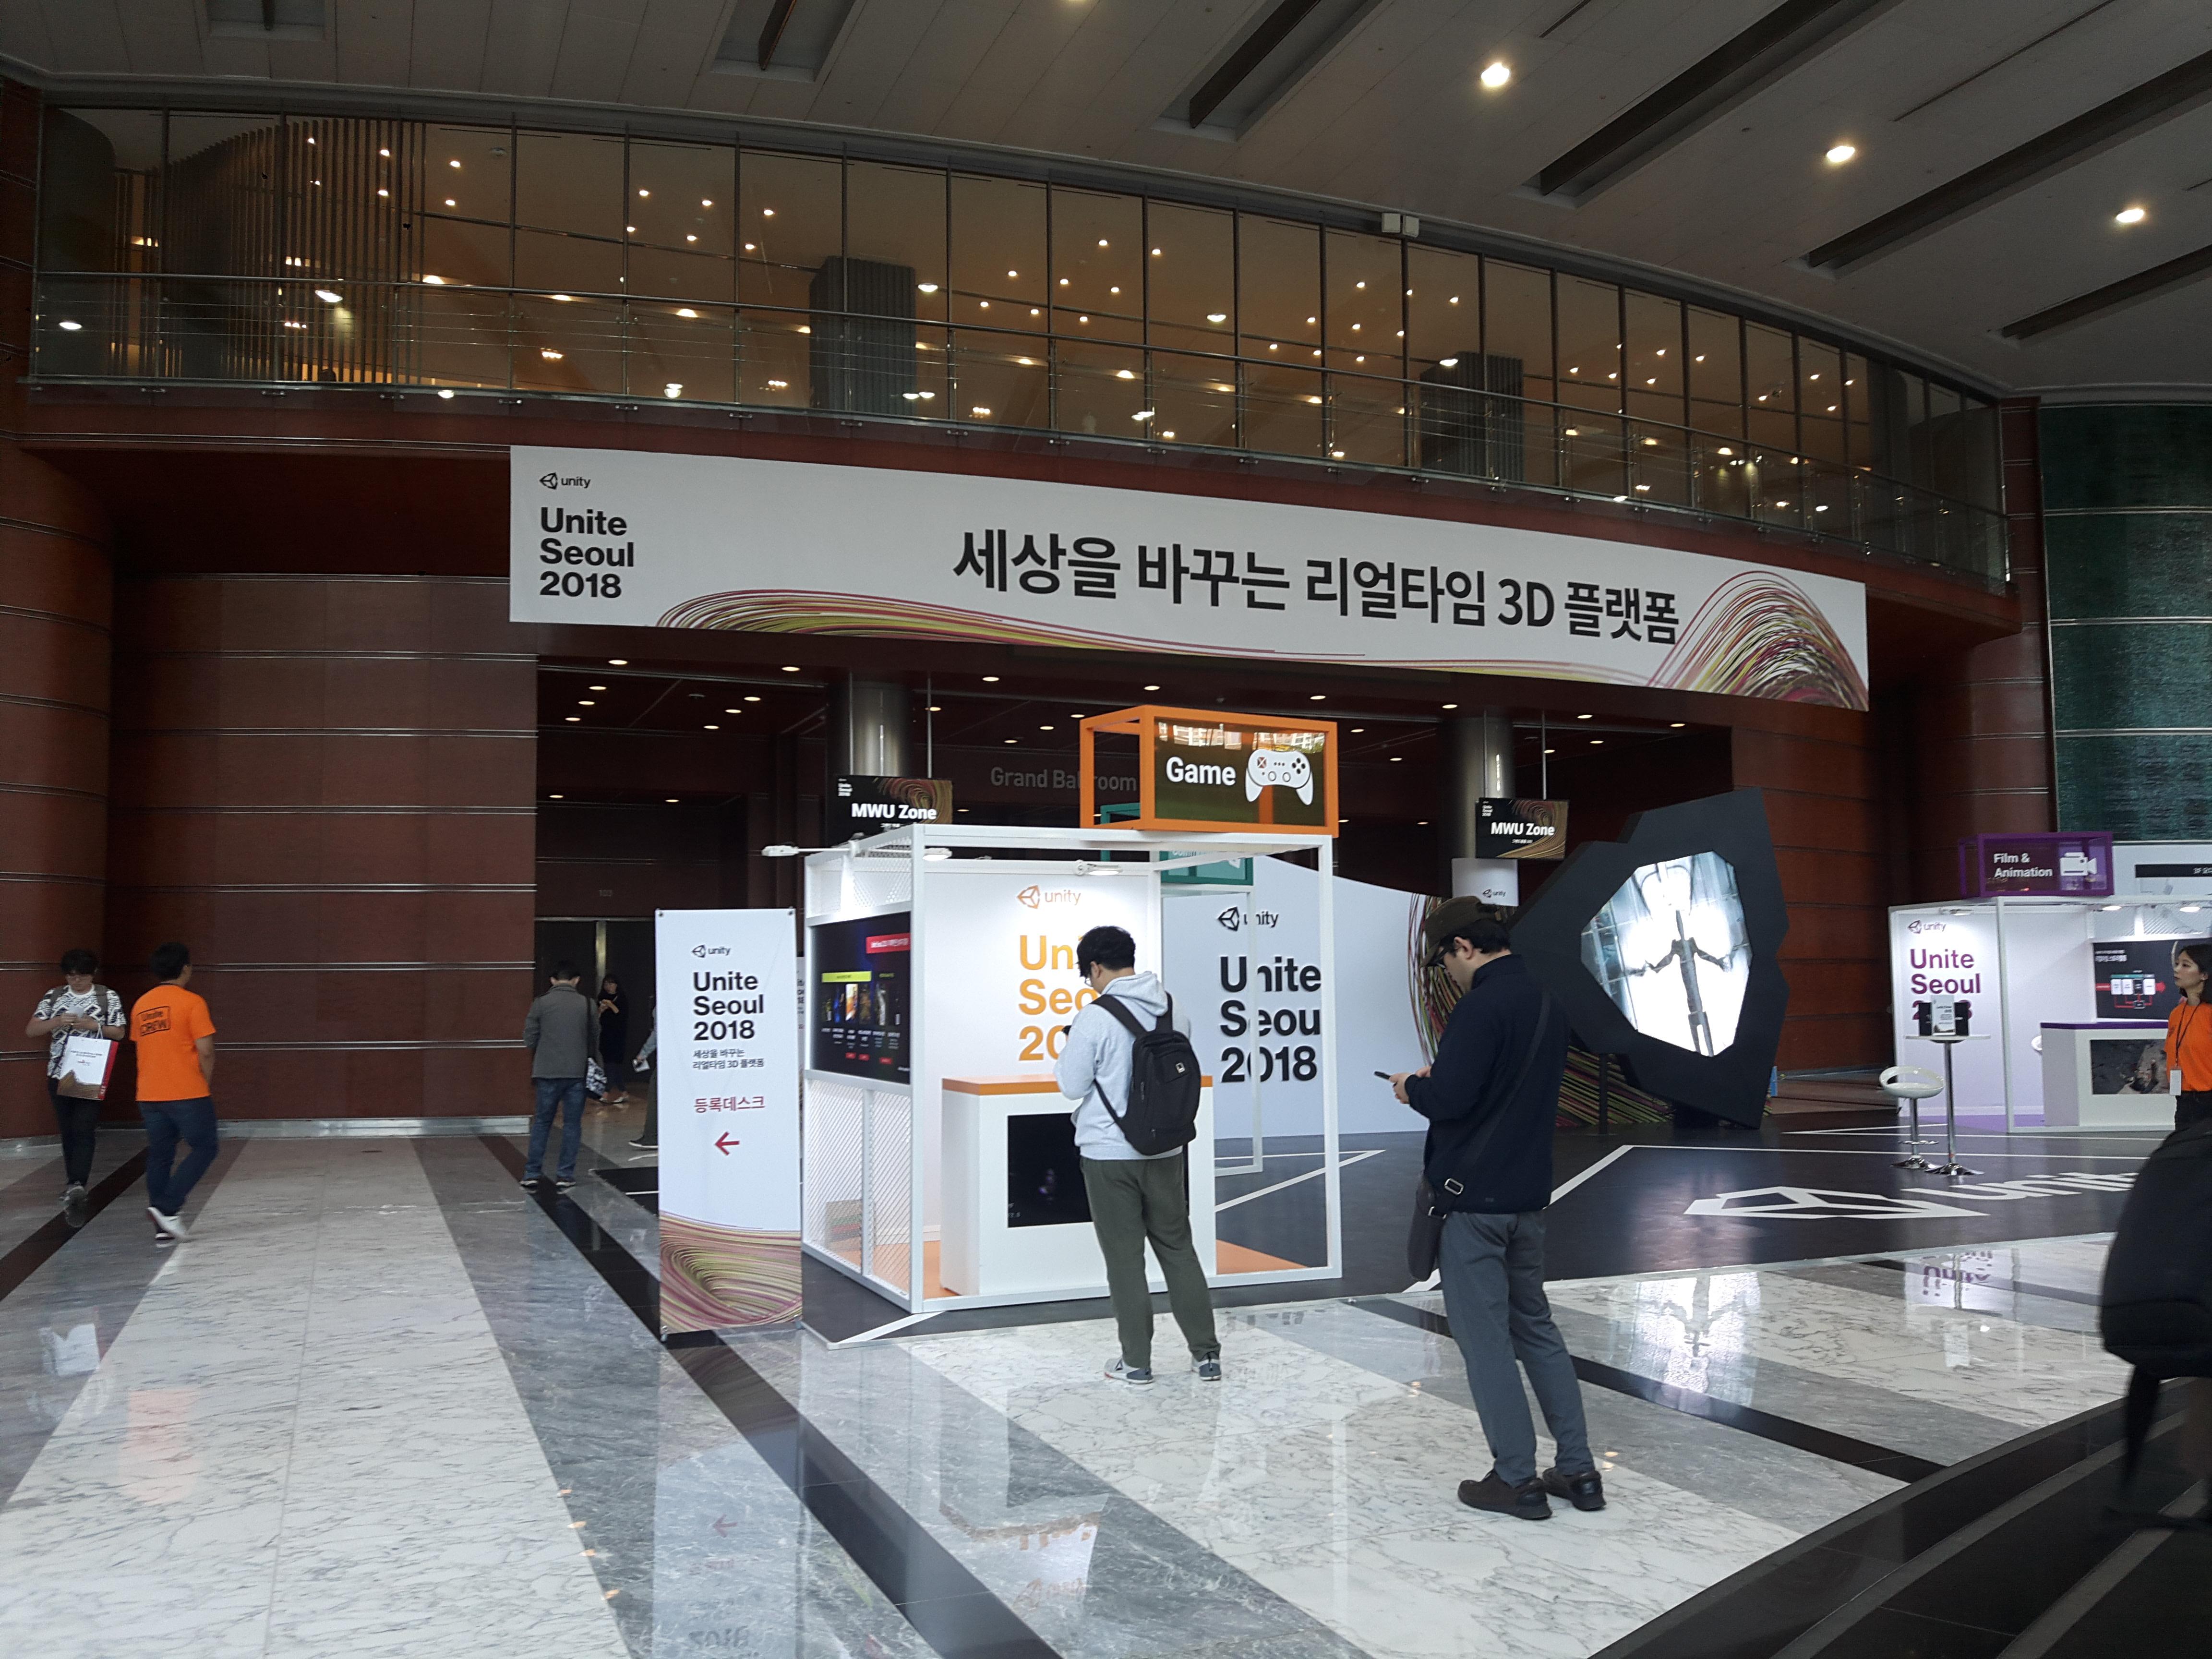 [Seminar] Unite Seoul 2018 (유나이트 서울 2018)